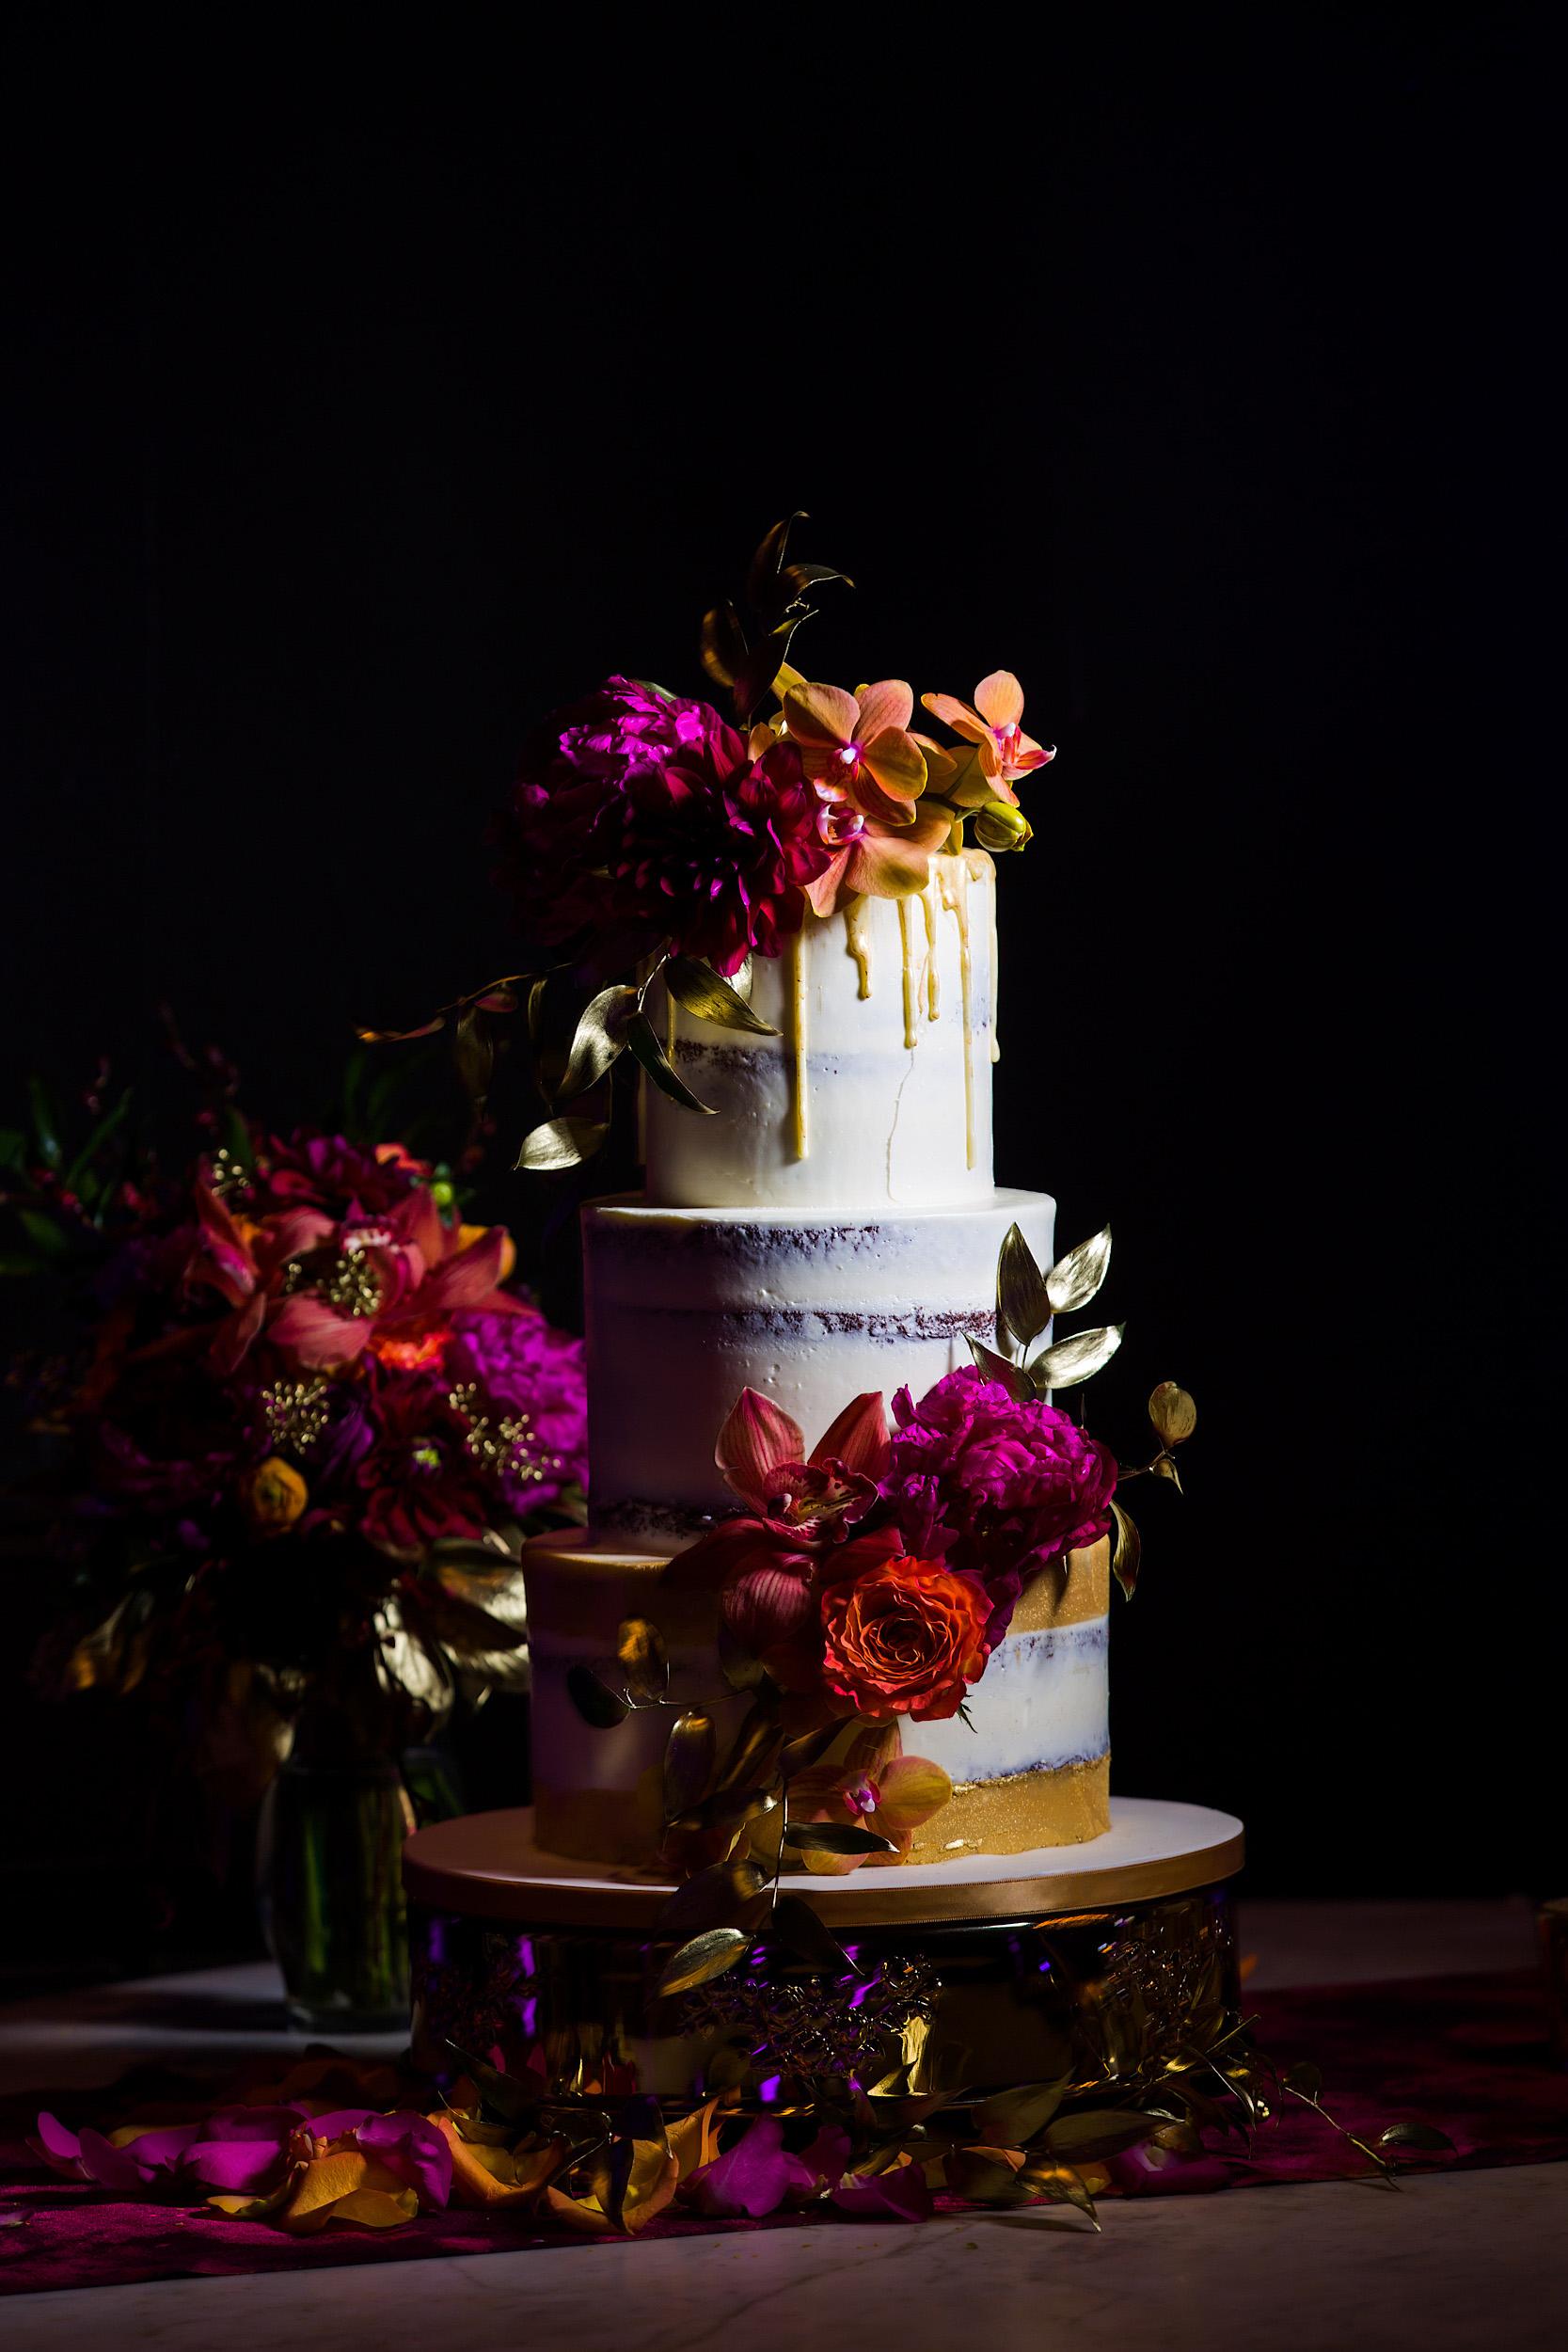 palazzo-lavaca-wedding-austin-9.jpg